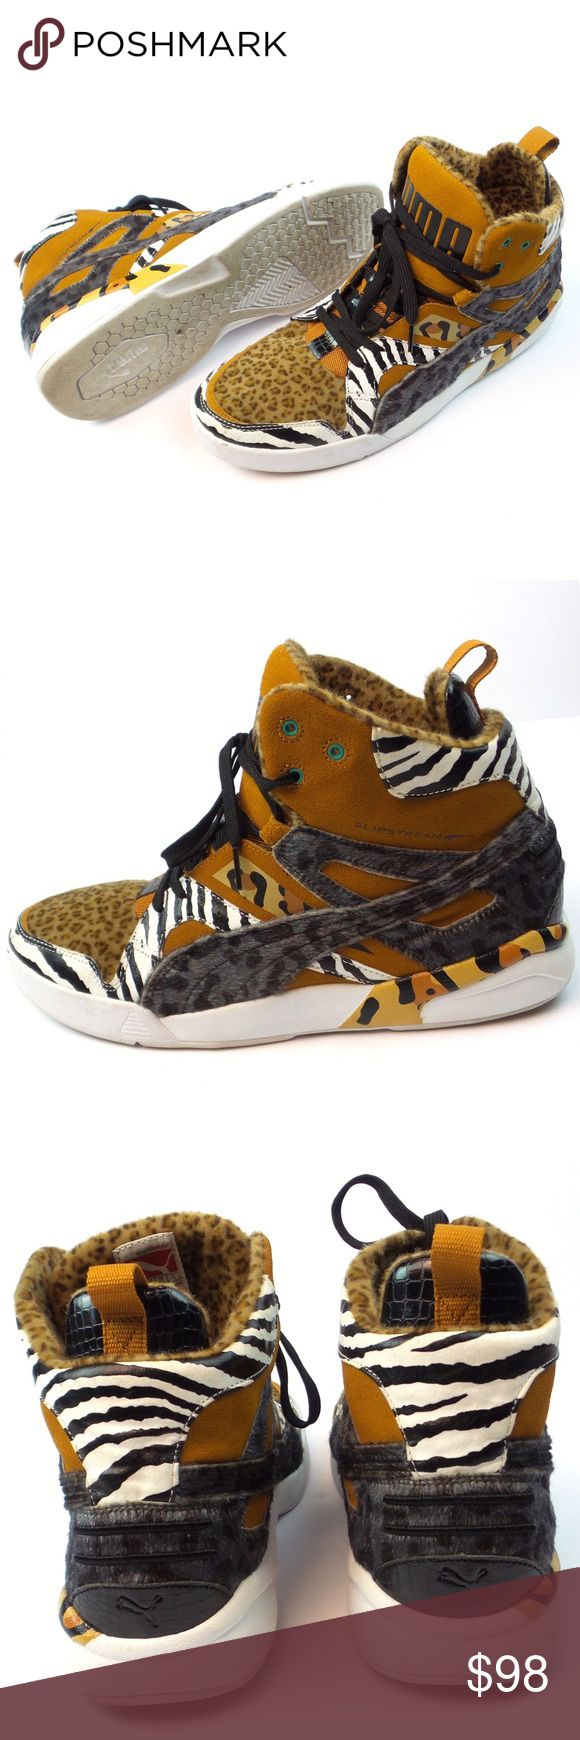 PUMA Sneakers Future Trinomic Slipstream Loapard PUMA Men's Sneakers 355657-01 Future Trinomic Slipstream Loapard Size 12 Puma Shoes Sneakers